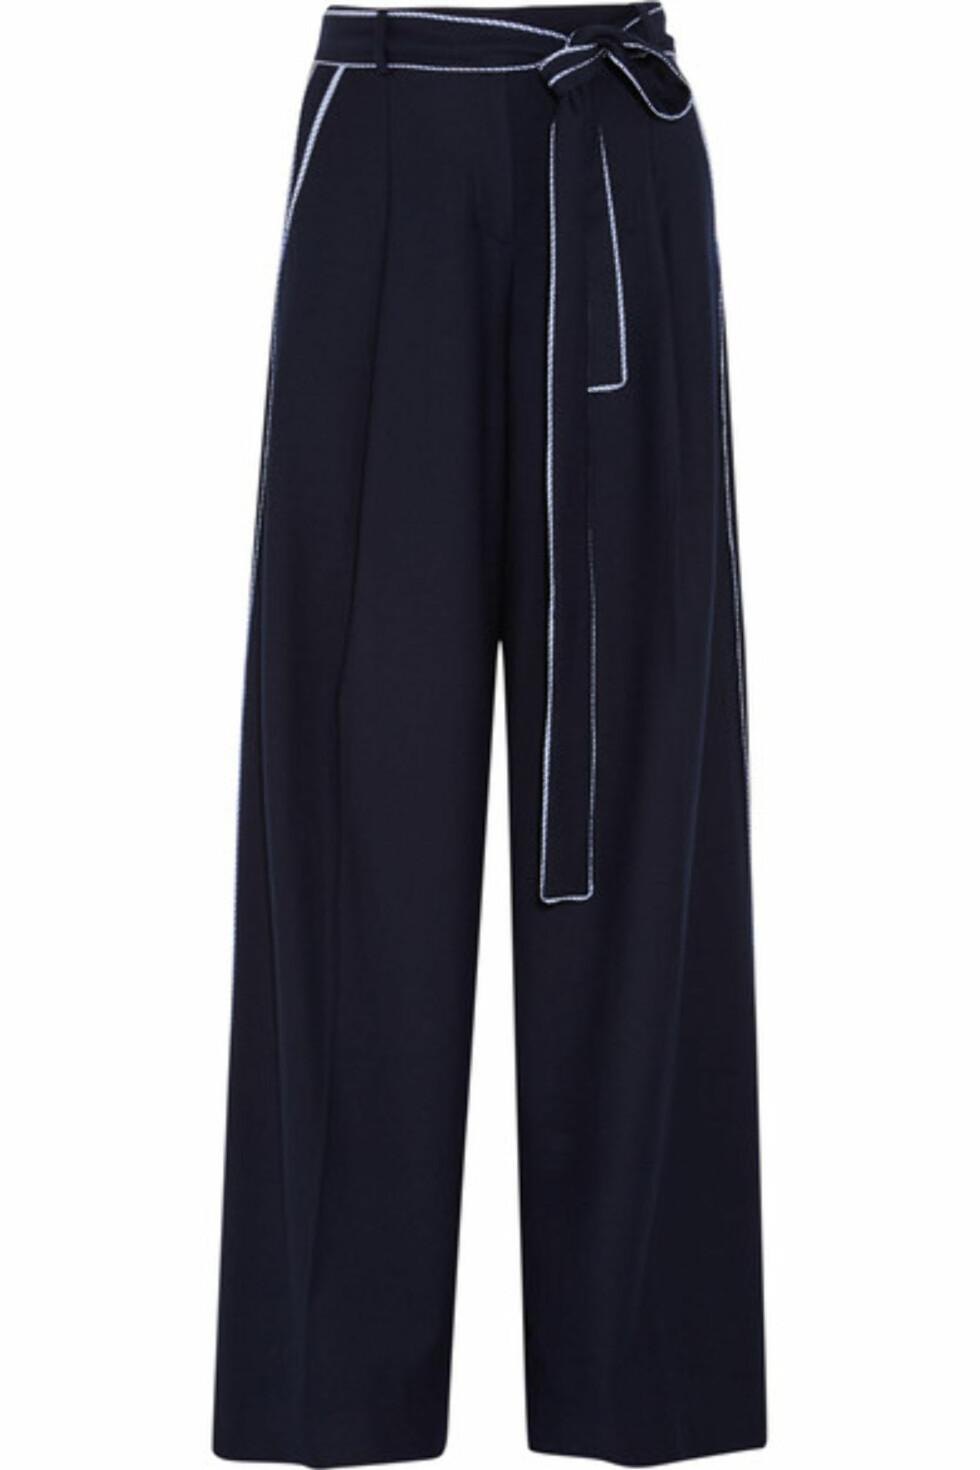 Bukse fra J.CREW via Net-a-porter.com | kr 1537 | https://www.net-a-porter.com/no/en/product/743509/j_crew/jitney-wool-blend-flannel-wide-leg-pants